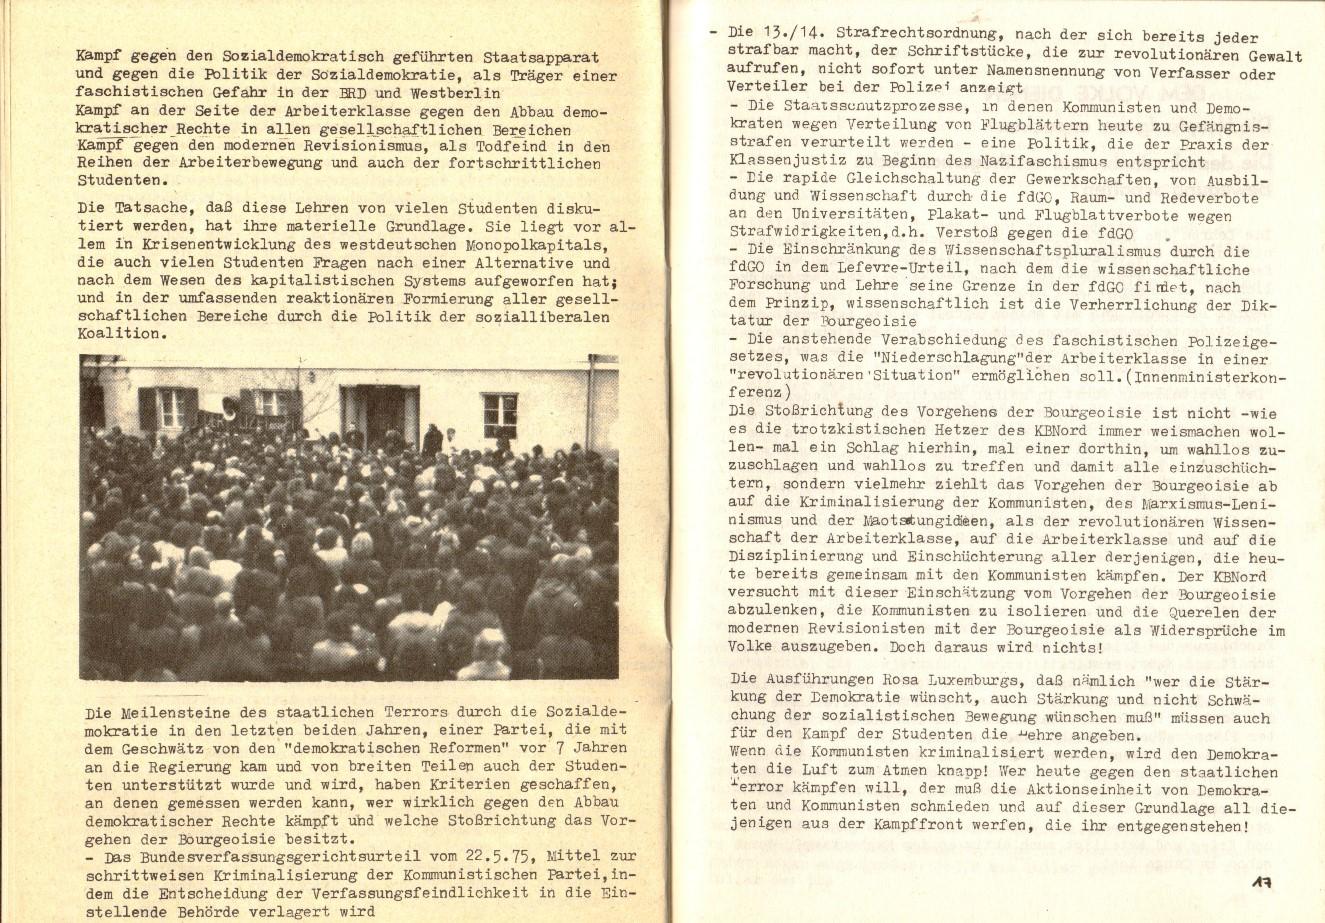 Berlin_KSV_1976_Streikkaempfe_09